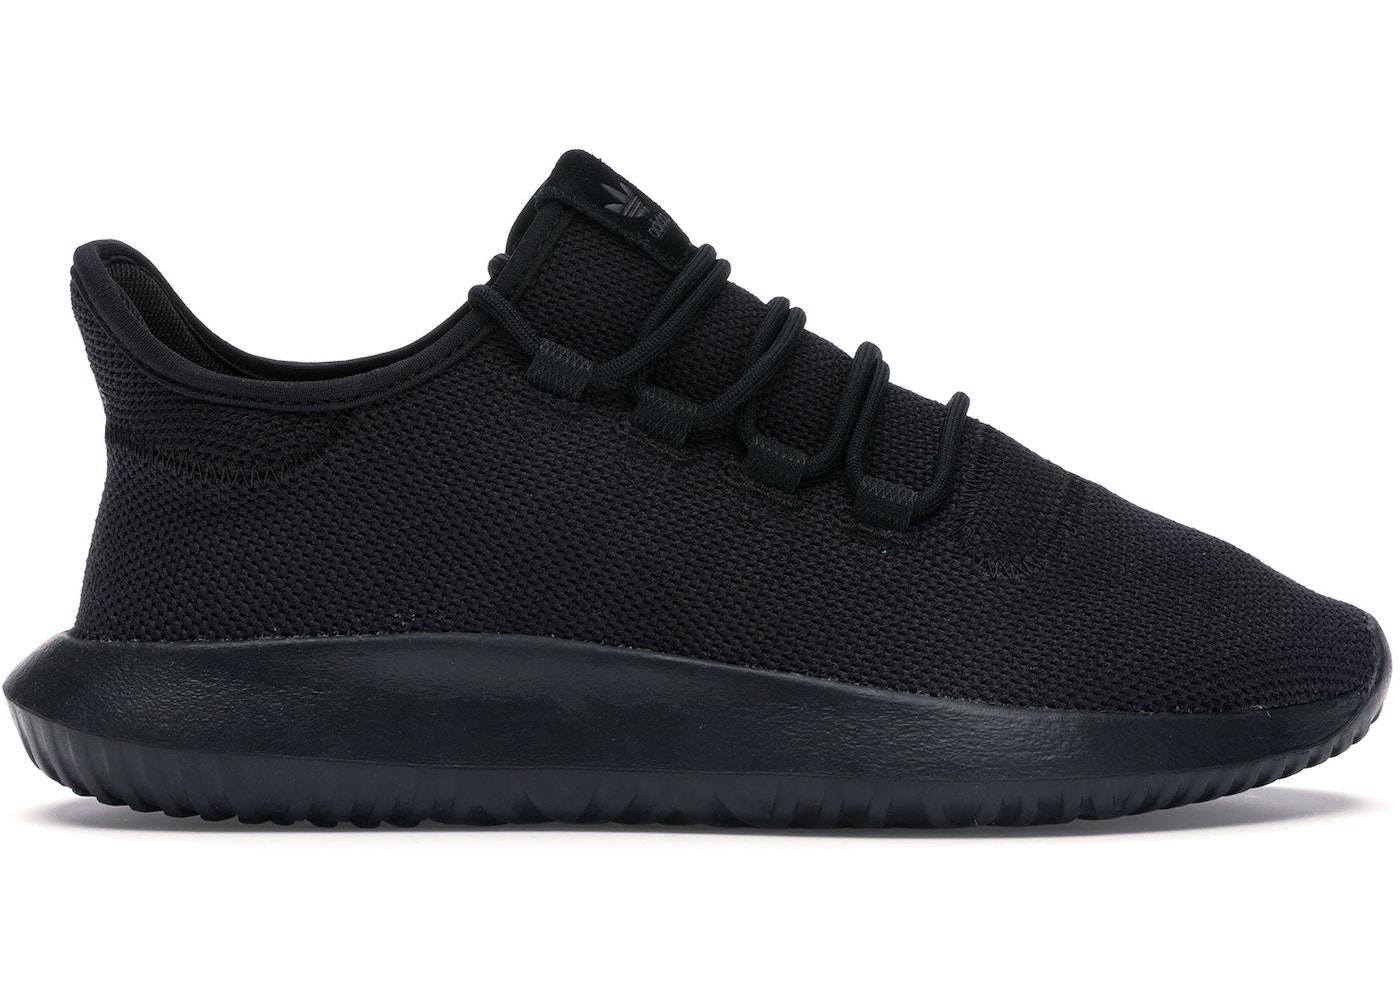 on sale 9993d 2c99c adidas Tubular Shadow Core Black